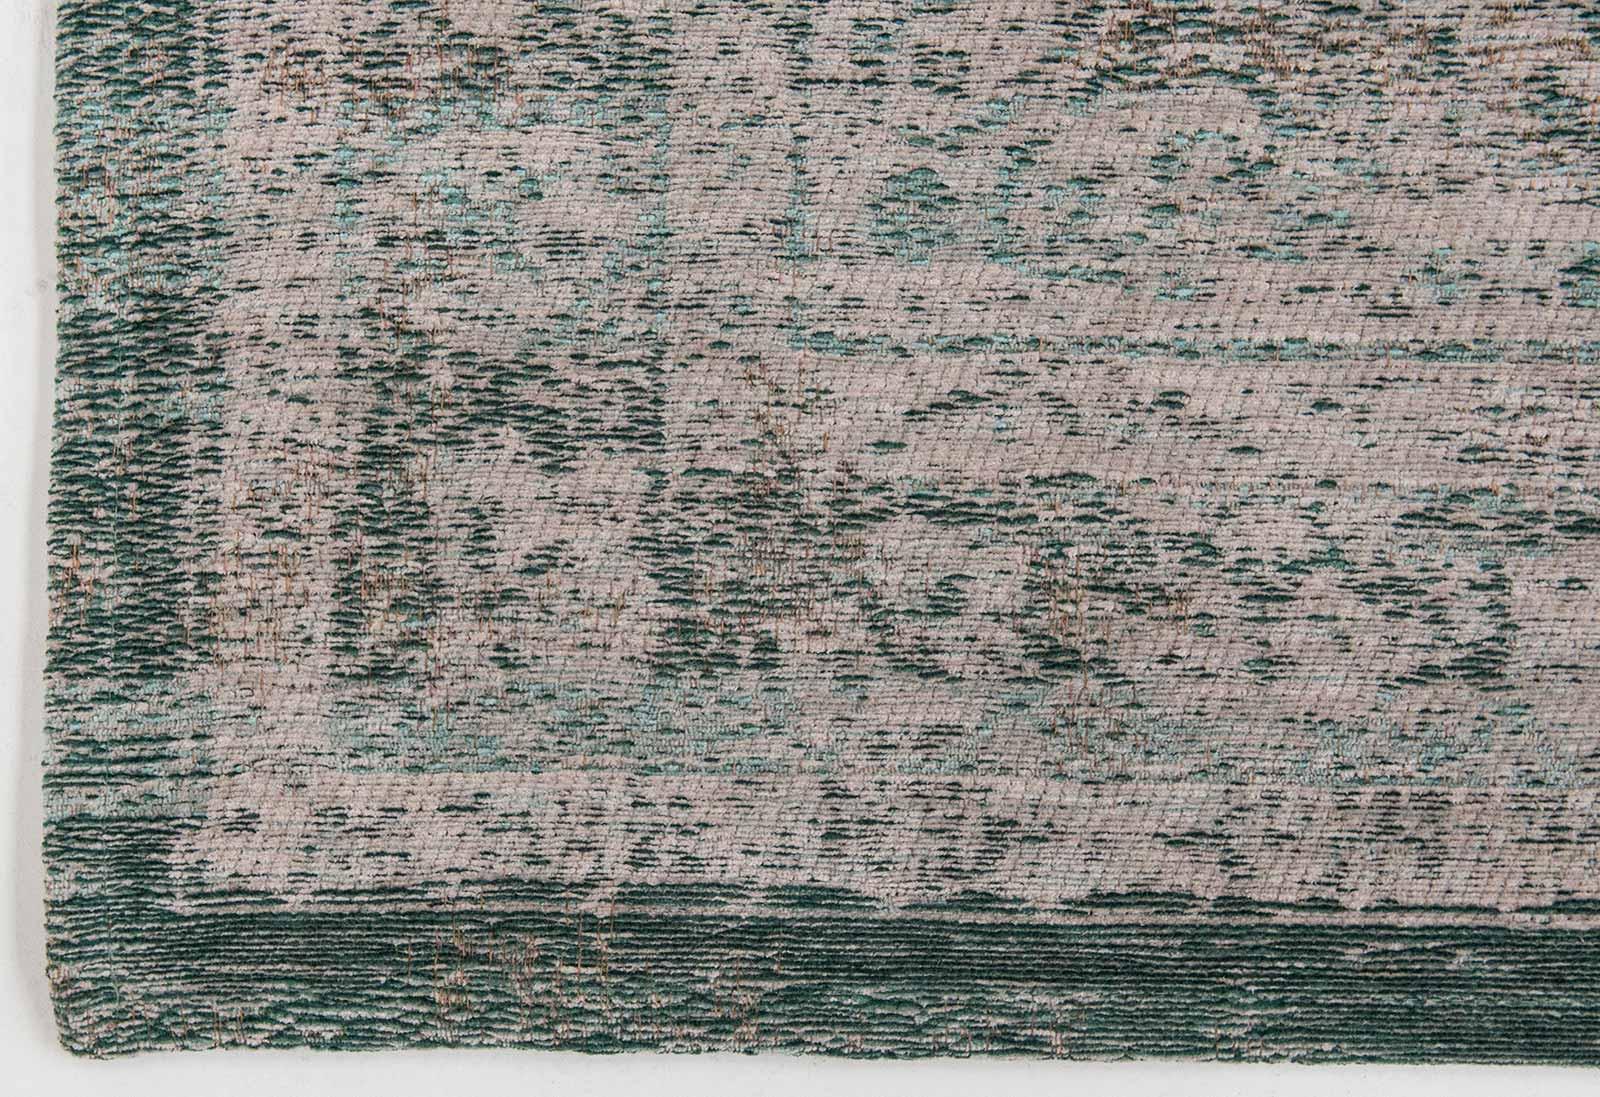 Louis de poortere tapis fading world jade oyster 8259 medallion design for Moquette louis depoortere